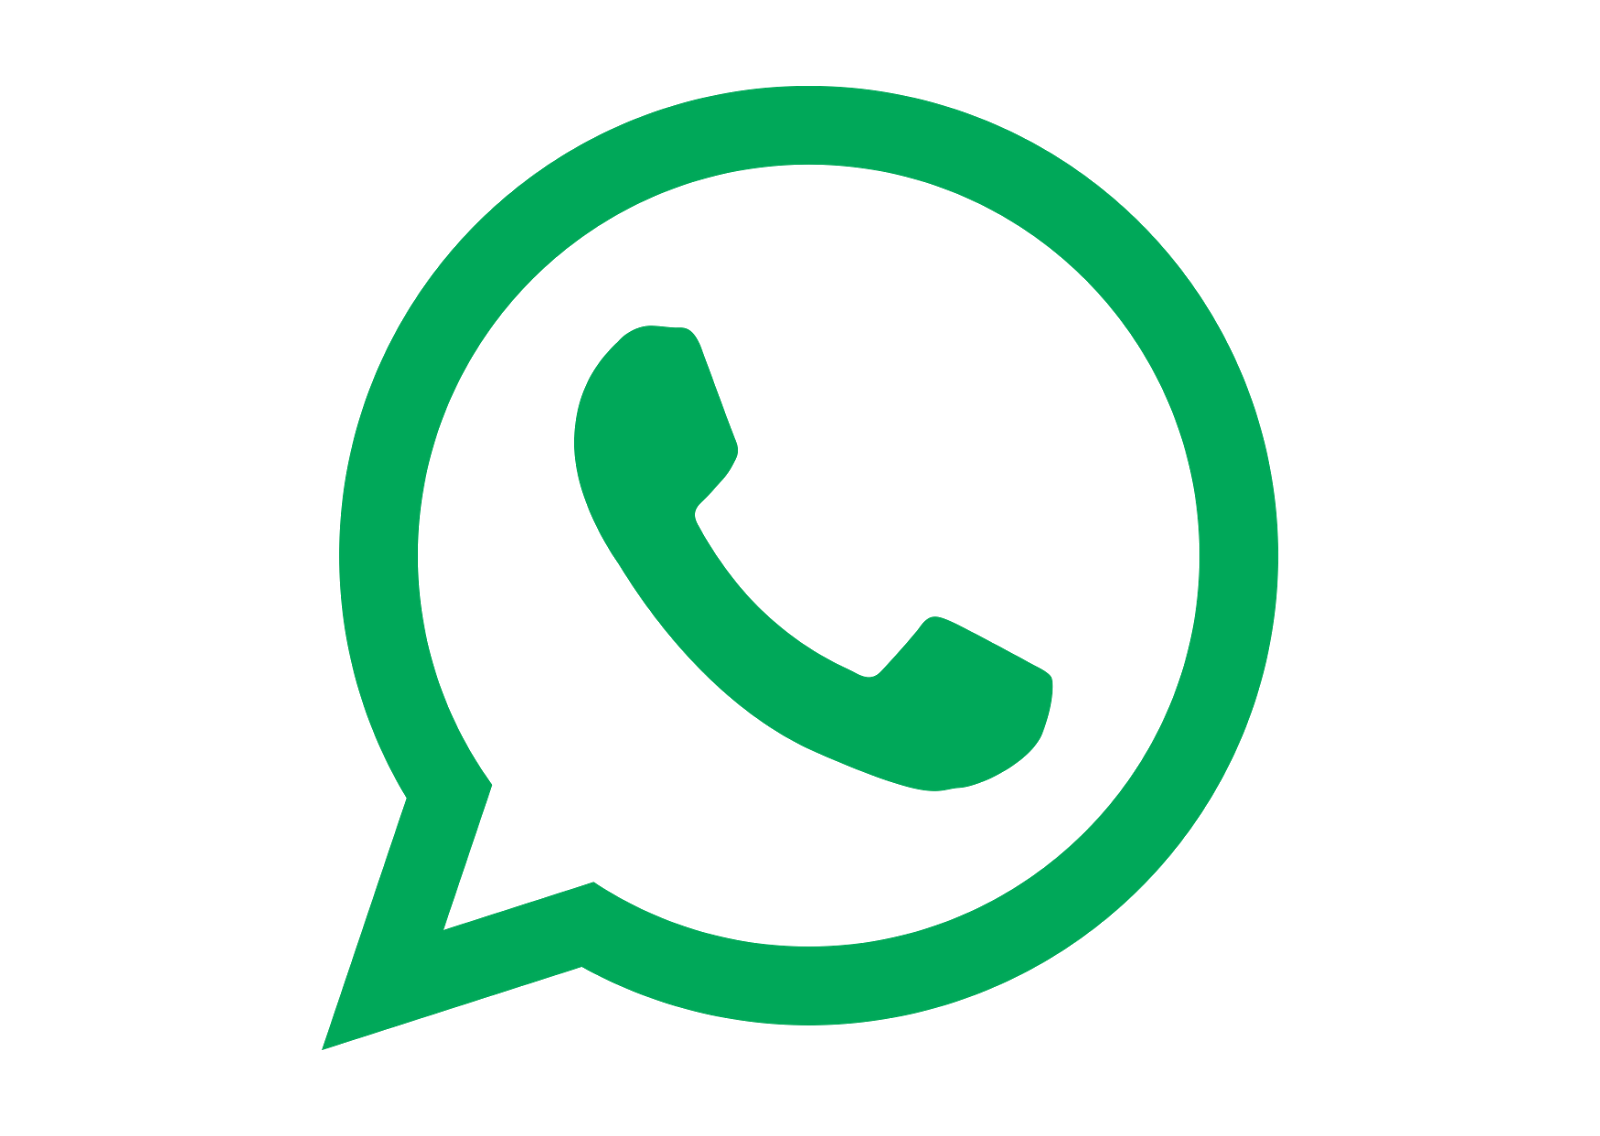 Whatsapp Logo Vector Download Free.